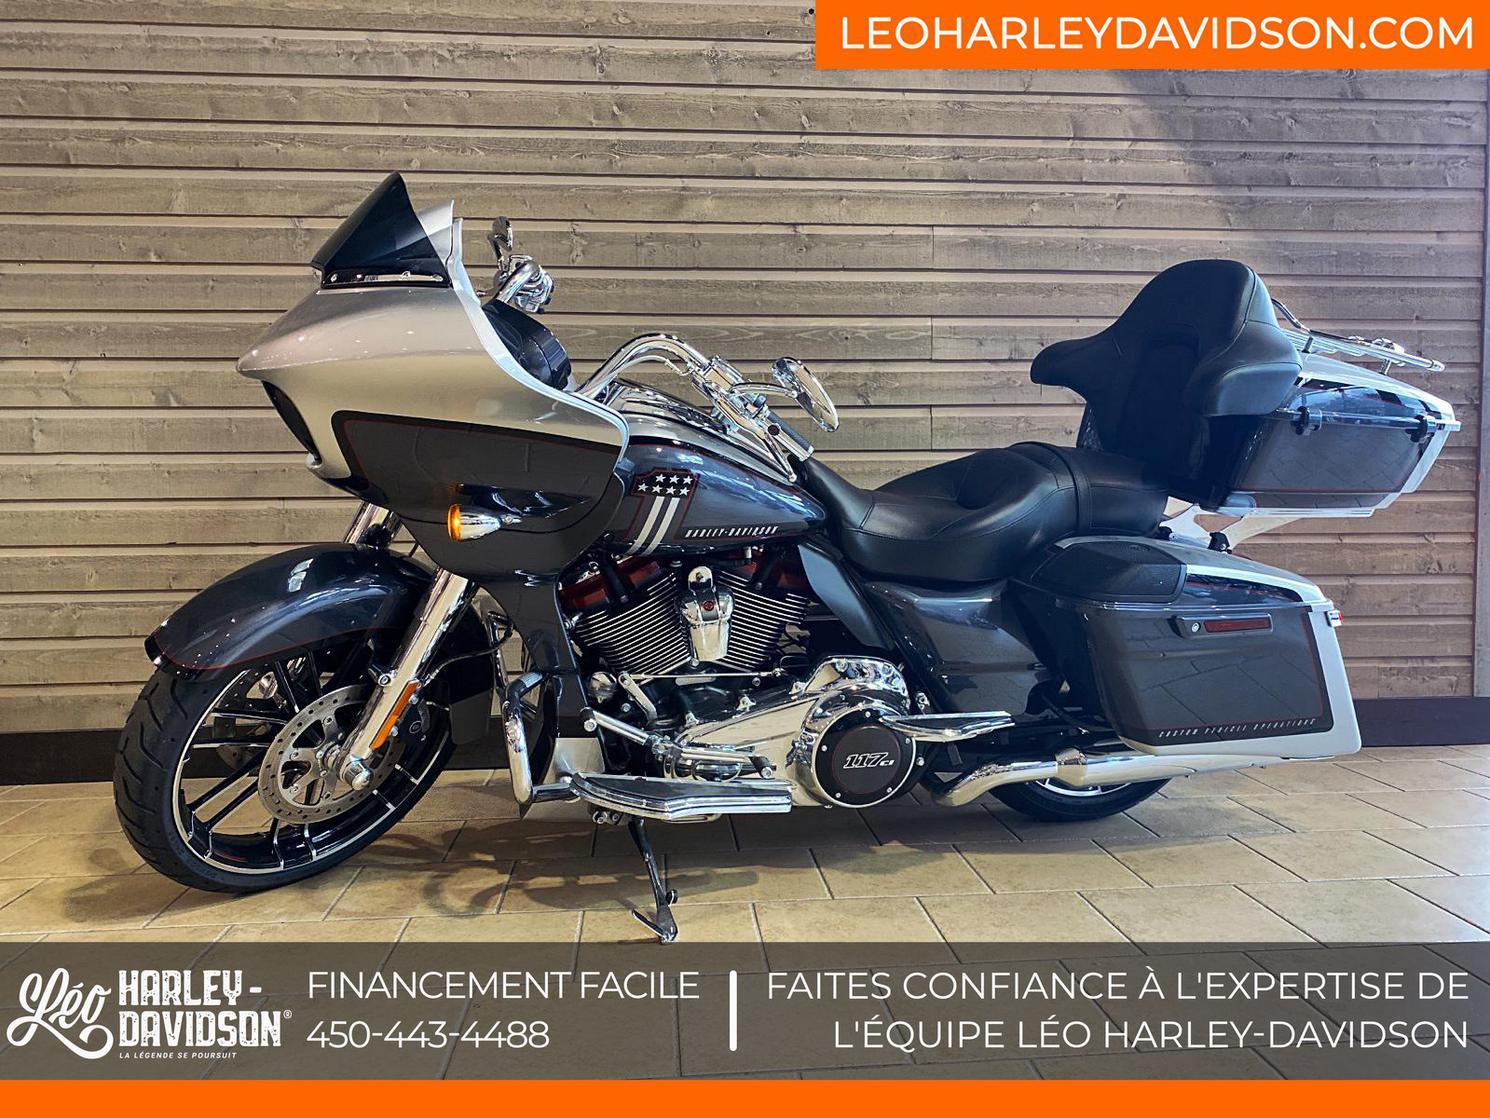 Harley-Davidson CVO-SE Road Glide 2019 - FLTRXSE